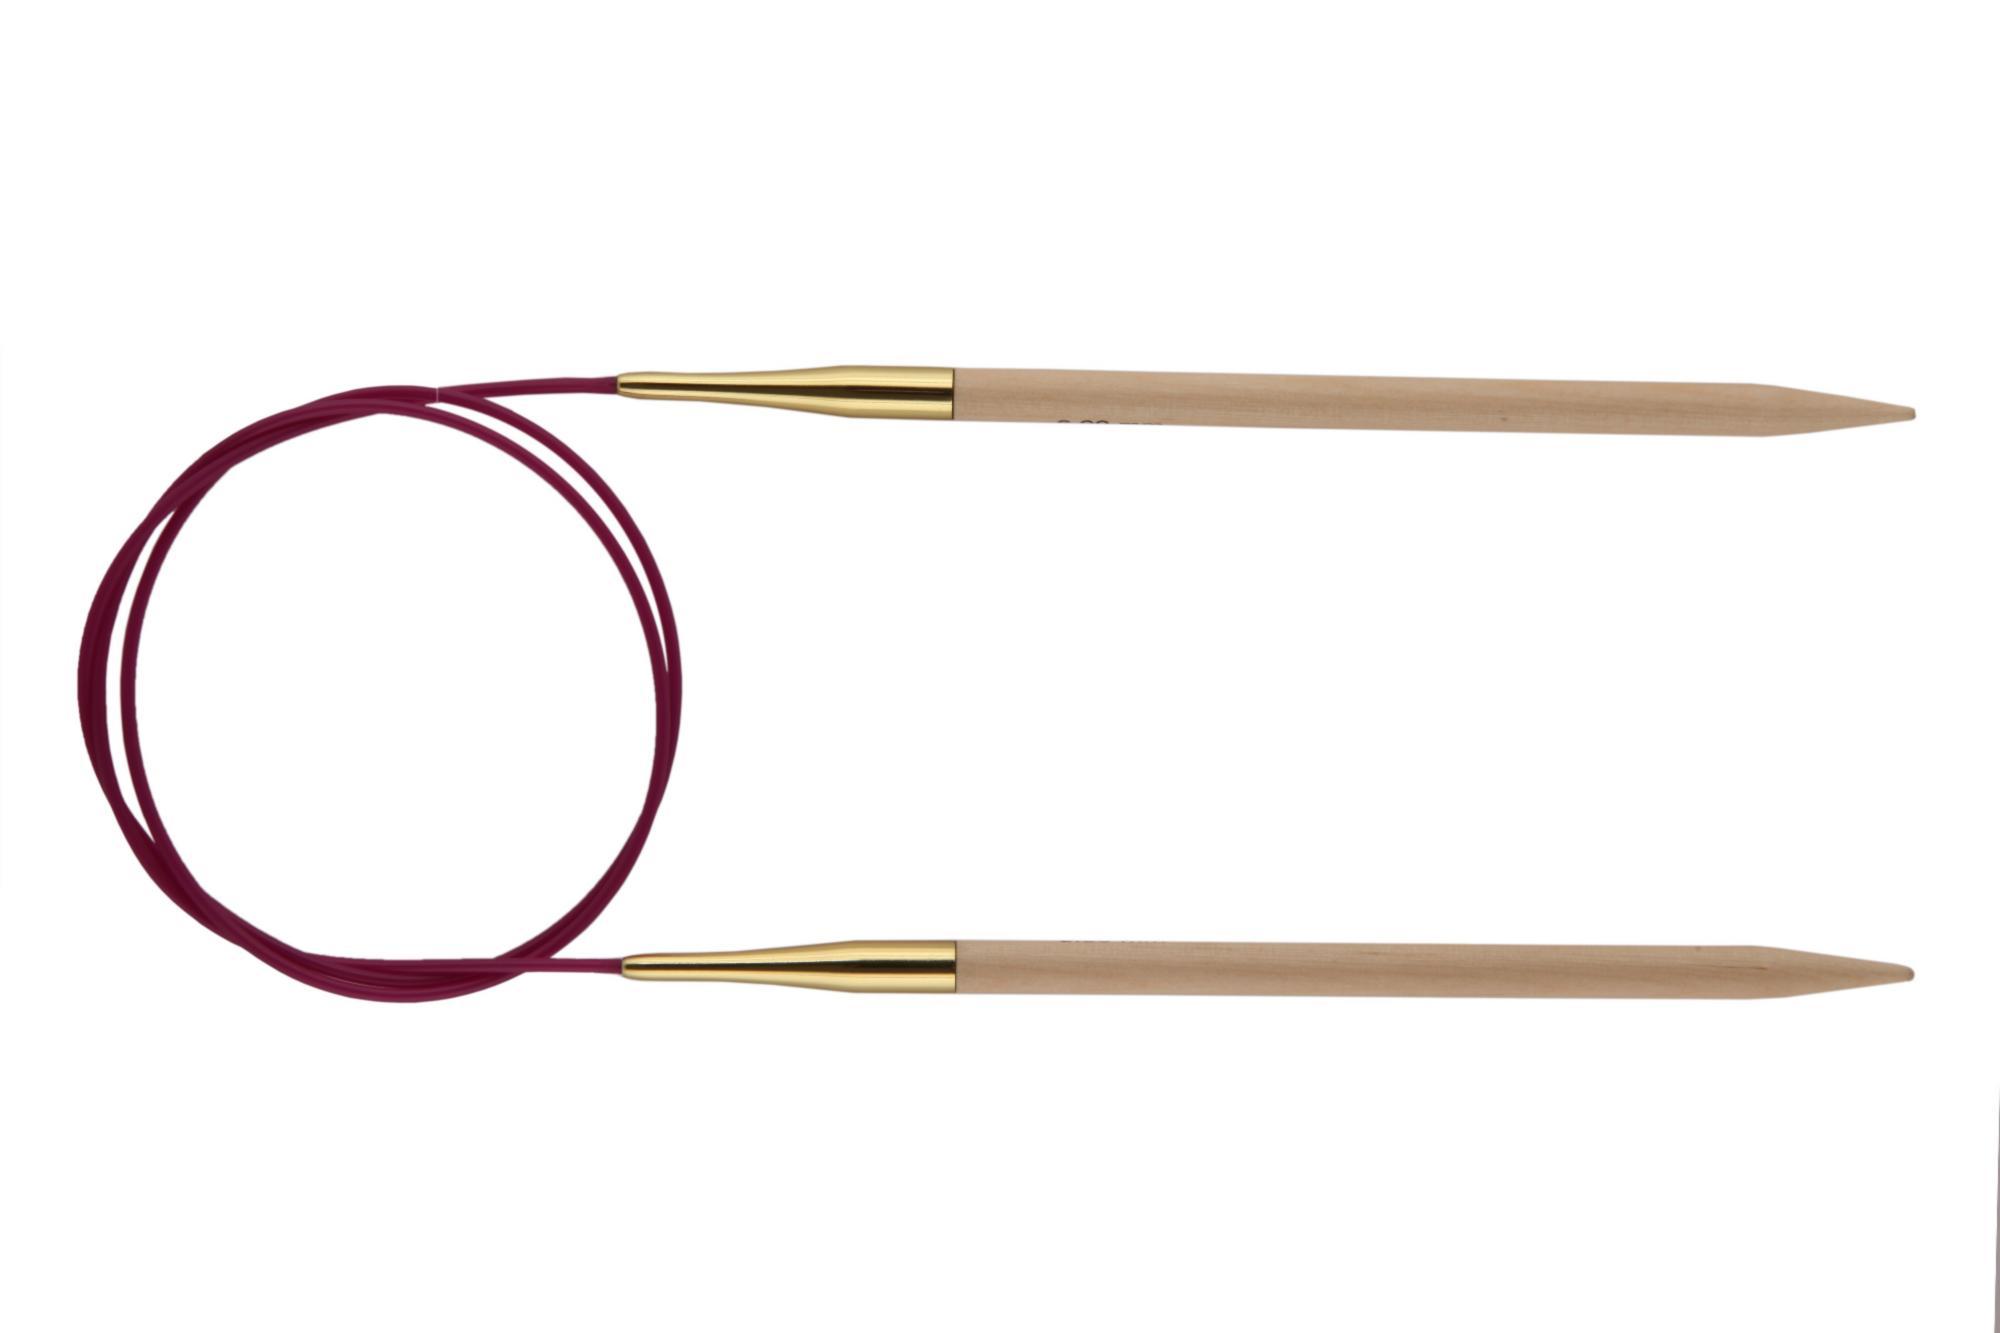 Спицы круговые 120 см Basix Birch Wood KnitPro, 35356, 9.00 мм